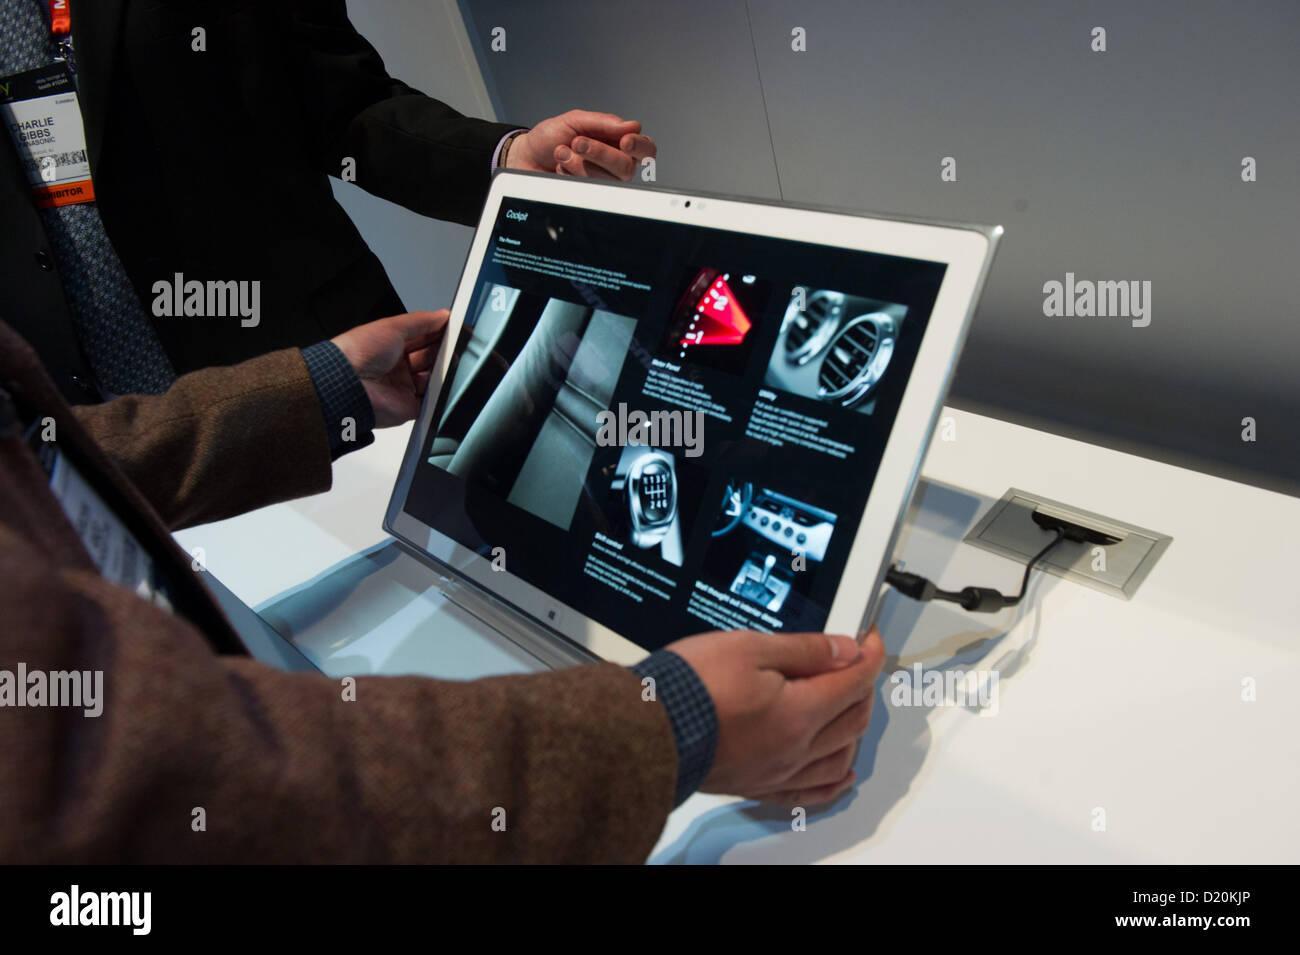 Las Vegas, USA - 08 / 01 / 2013. Ein CES-Teilnehmer hebt Panasonics 20' 4 k Tablet mit einem Panasonic-Vertreter Stockbild